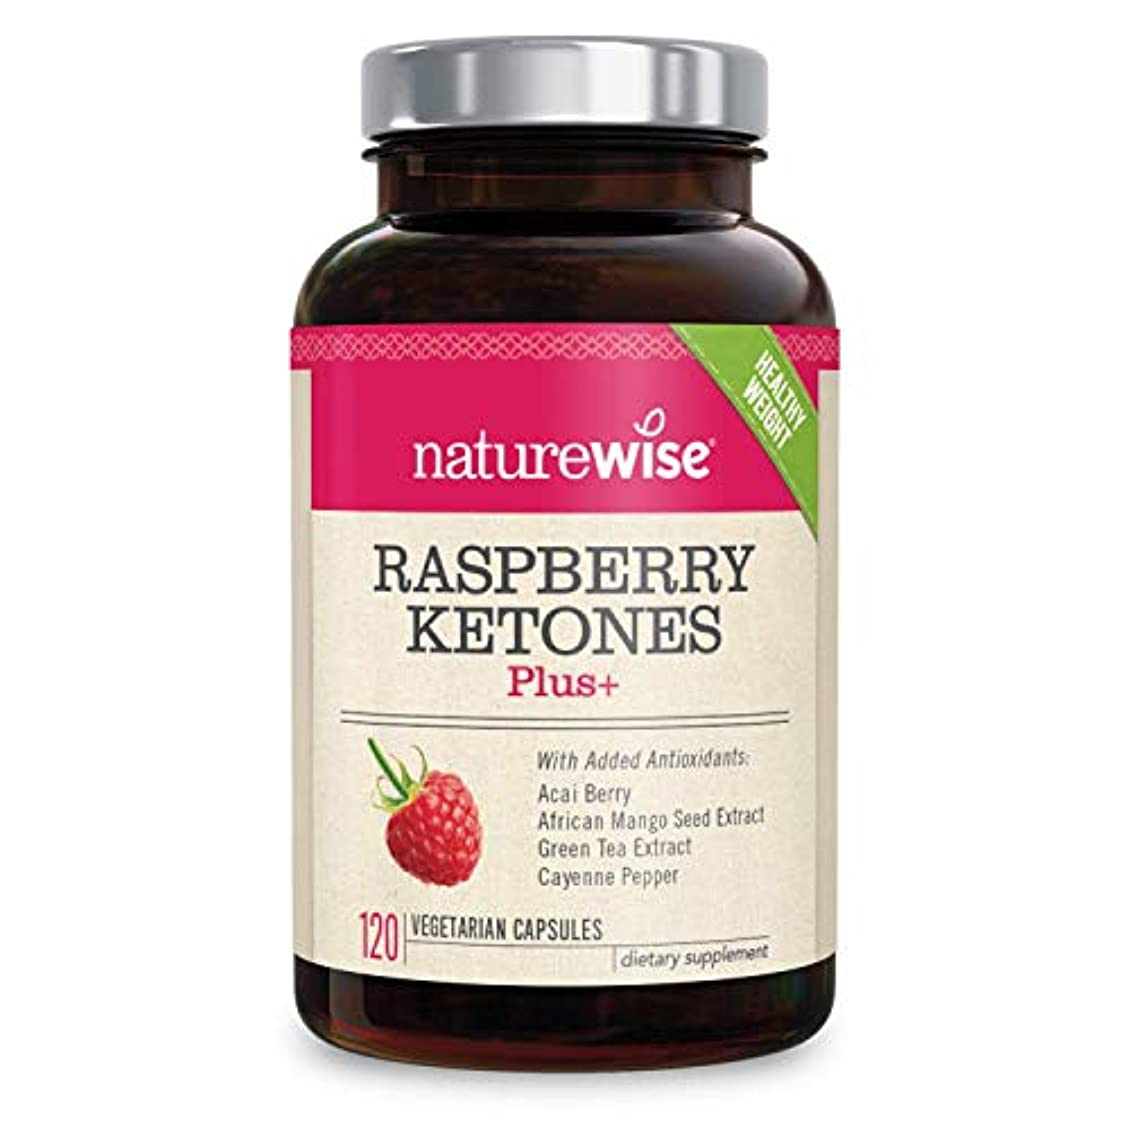 NatureWise Raspberry Ketones Plus ラズベリー ケトン プラス ケトジェニック ダイエット サプリ 120粒/60日分 [海外直送品]